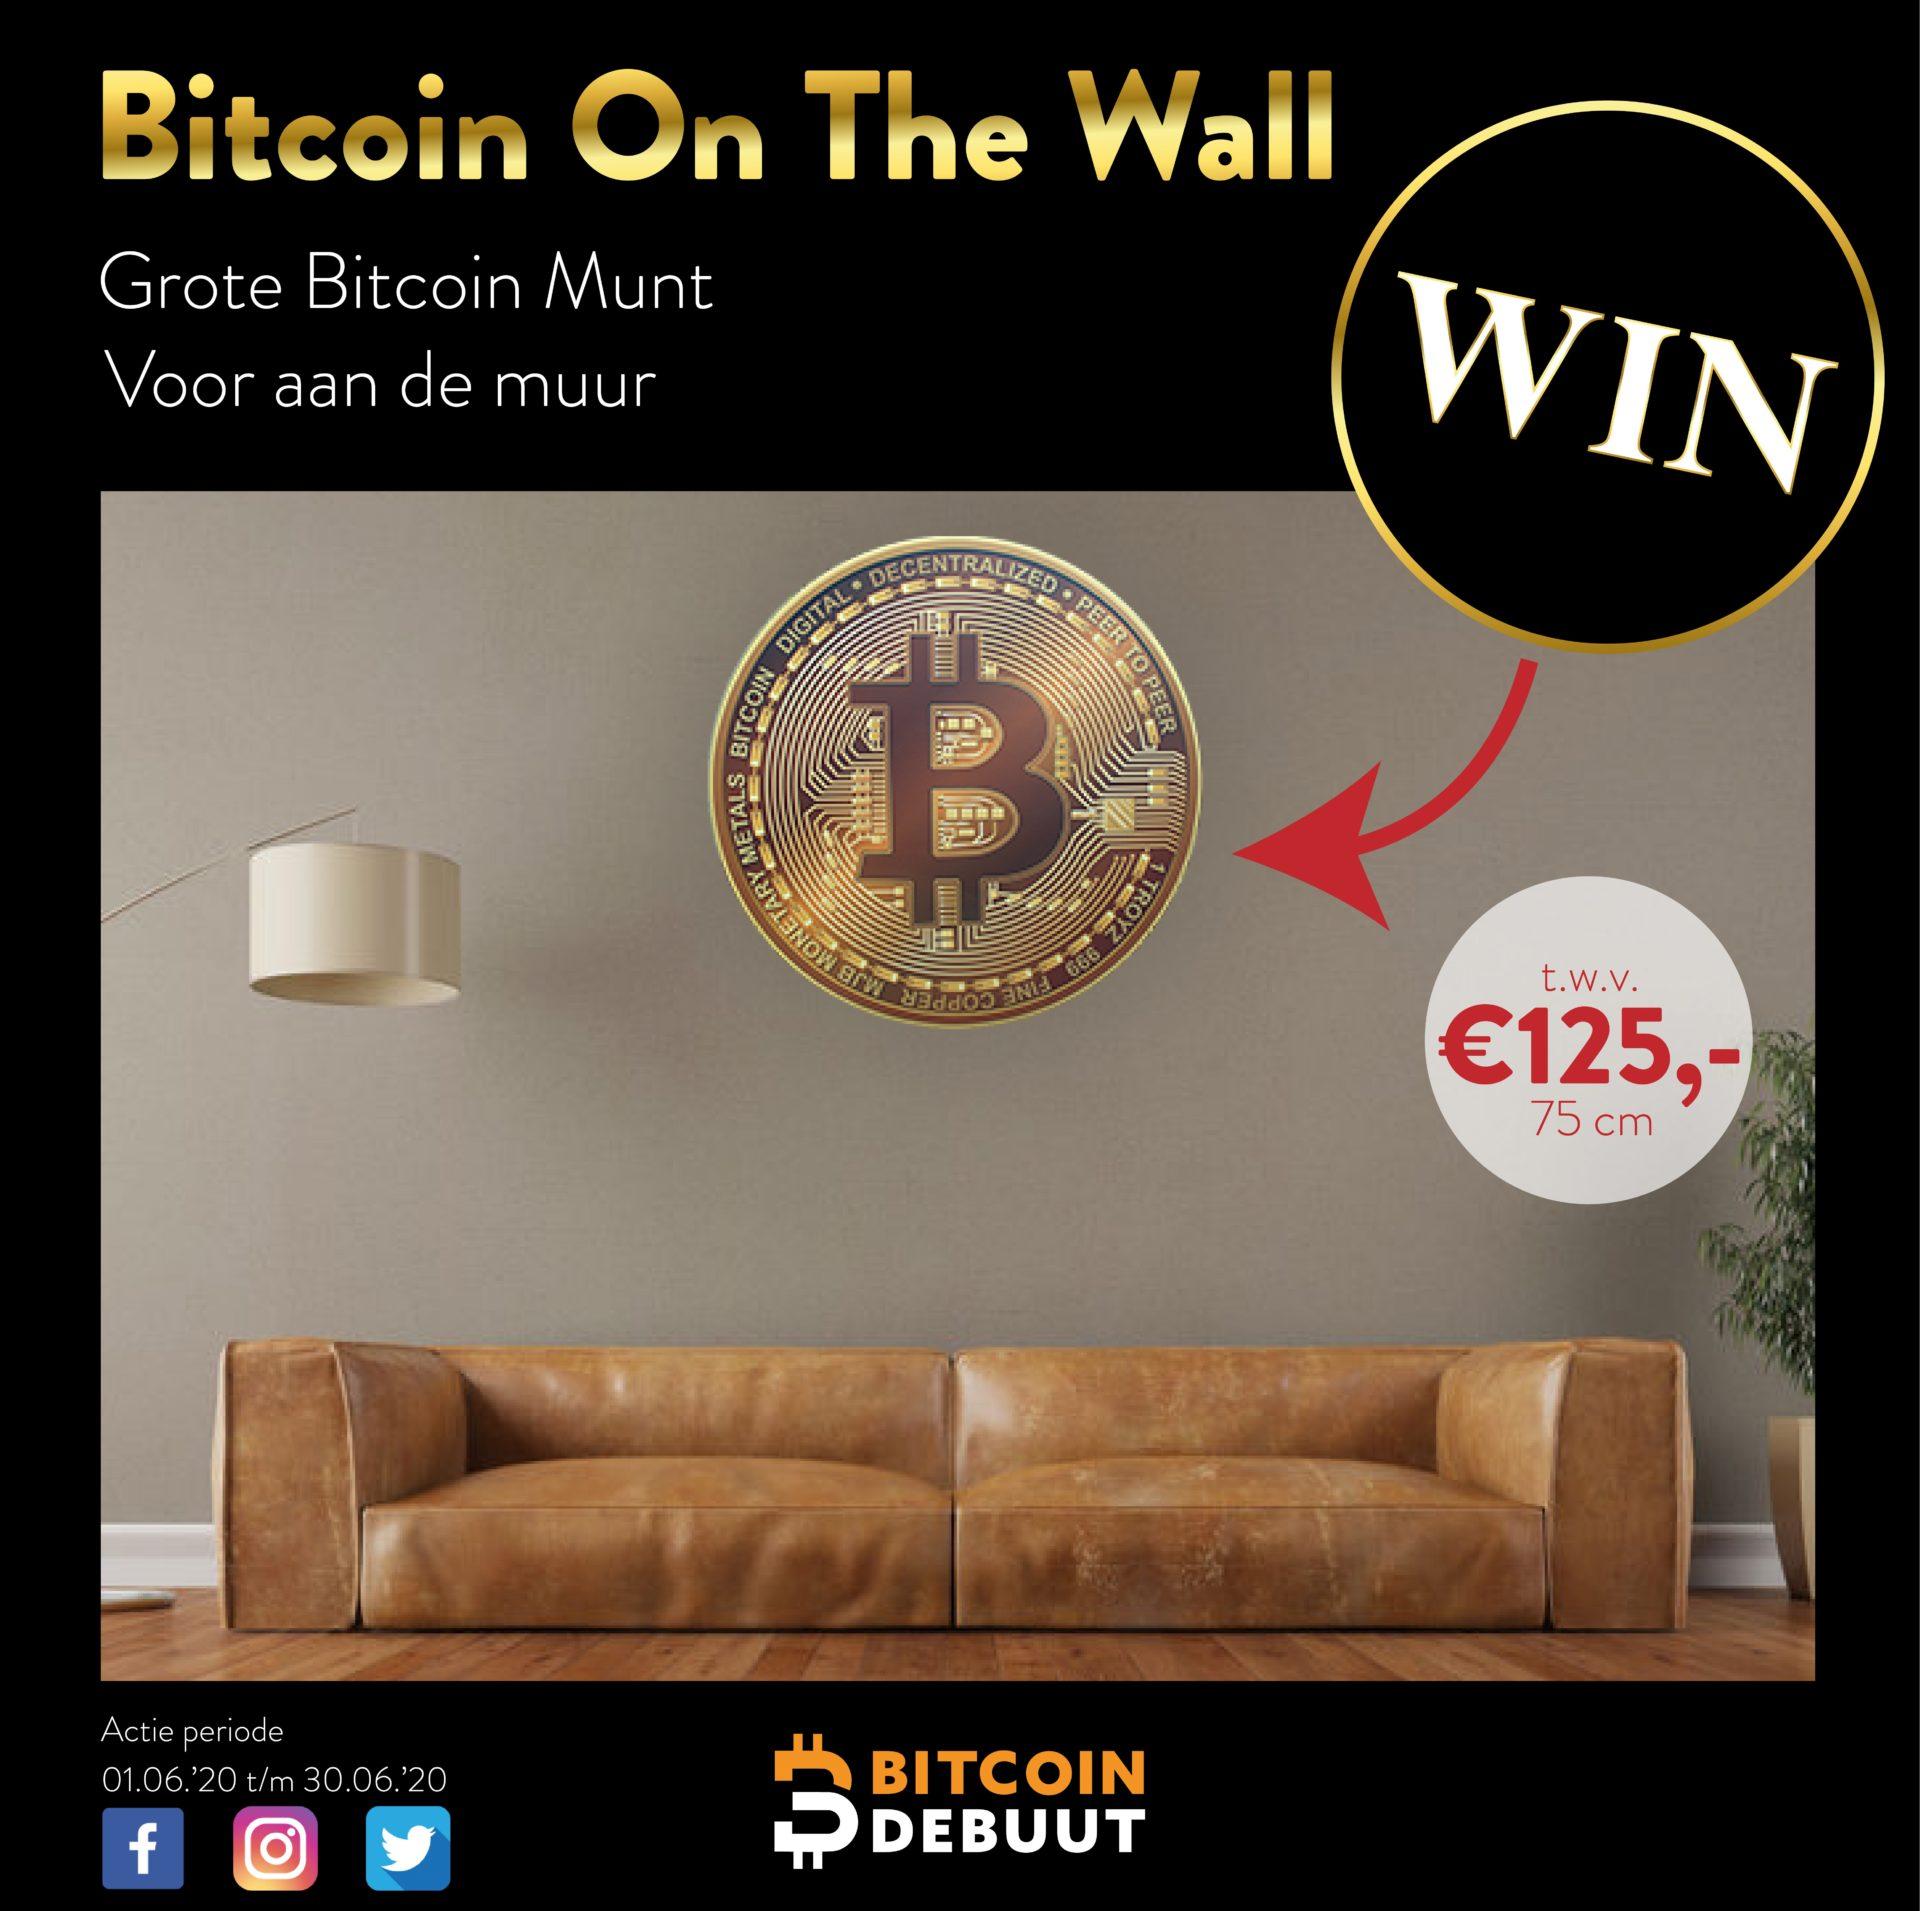 WINACTIE | Bitcoin Debuut